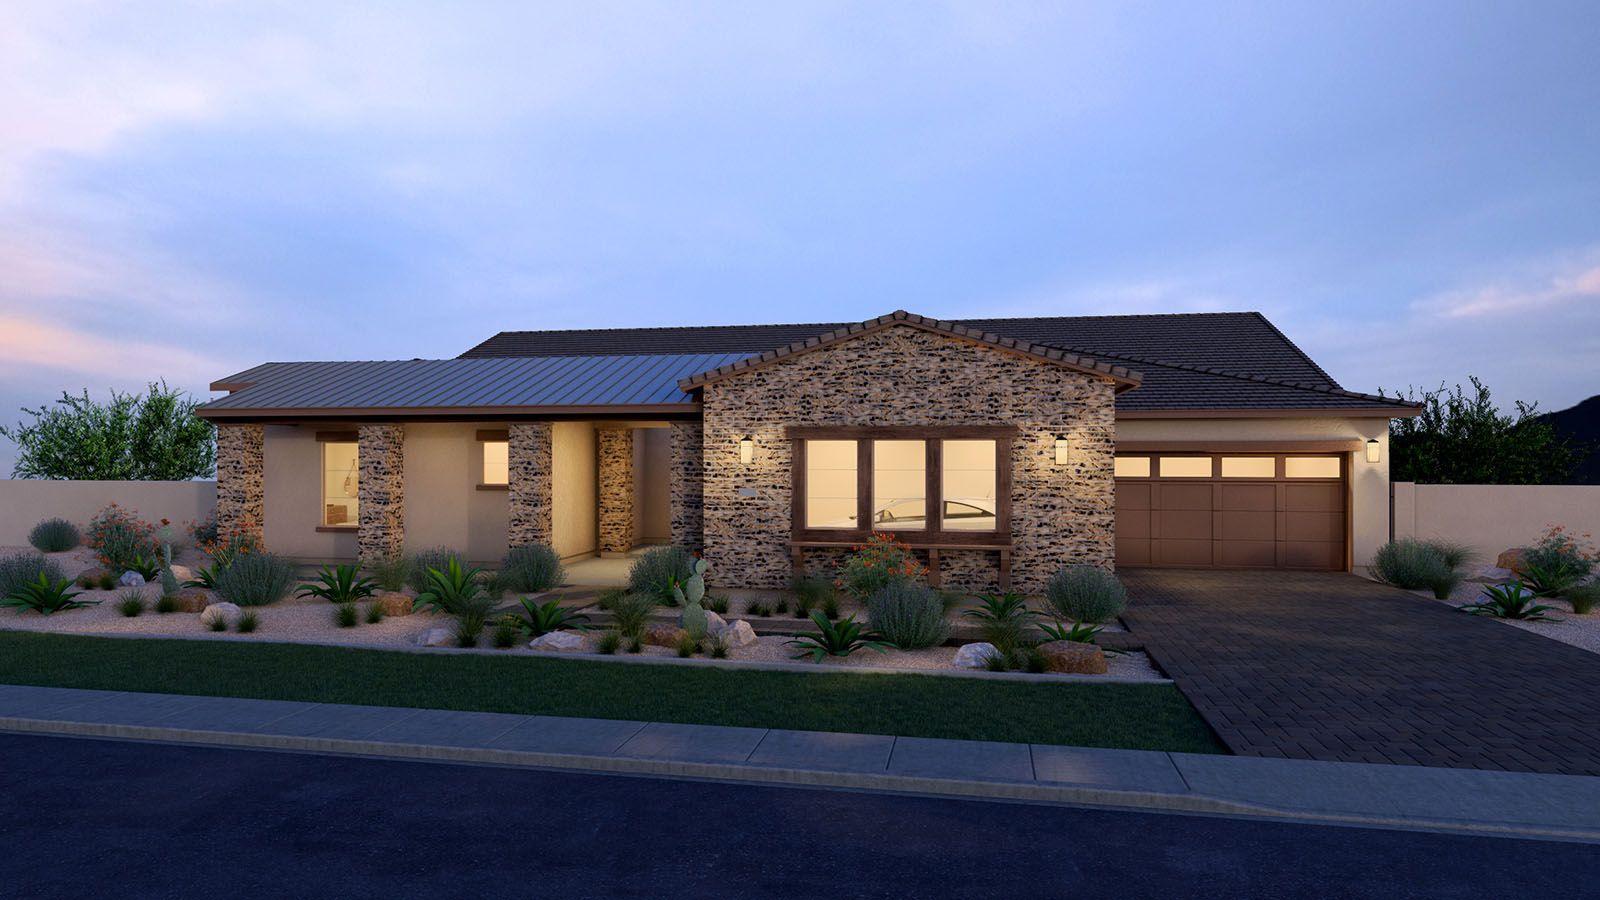 MH-residence-Domaine-78-2-C-DUSK-R:Ranch Elevation